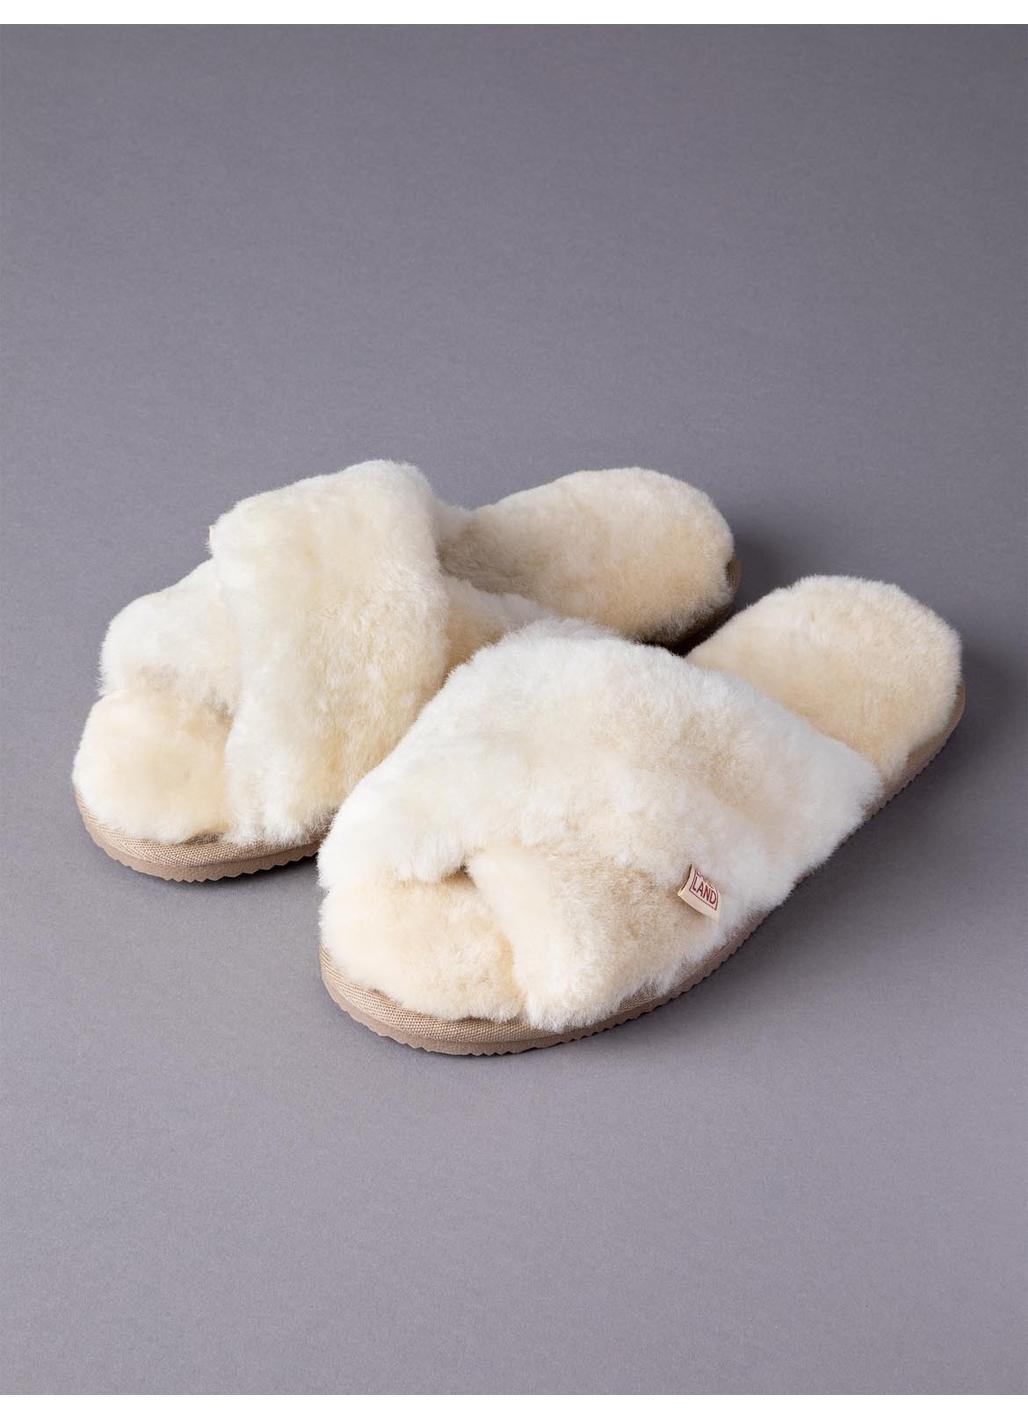 Ladies' Sheepskin Cross-Over Mules in Cream